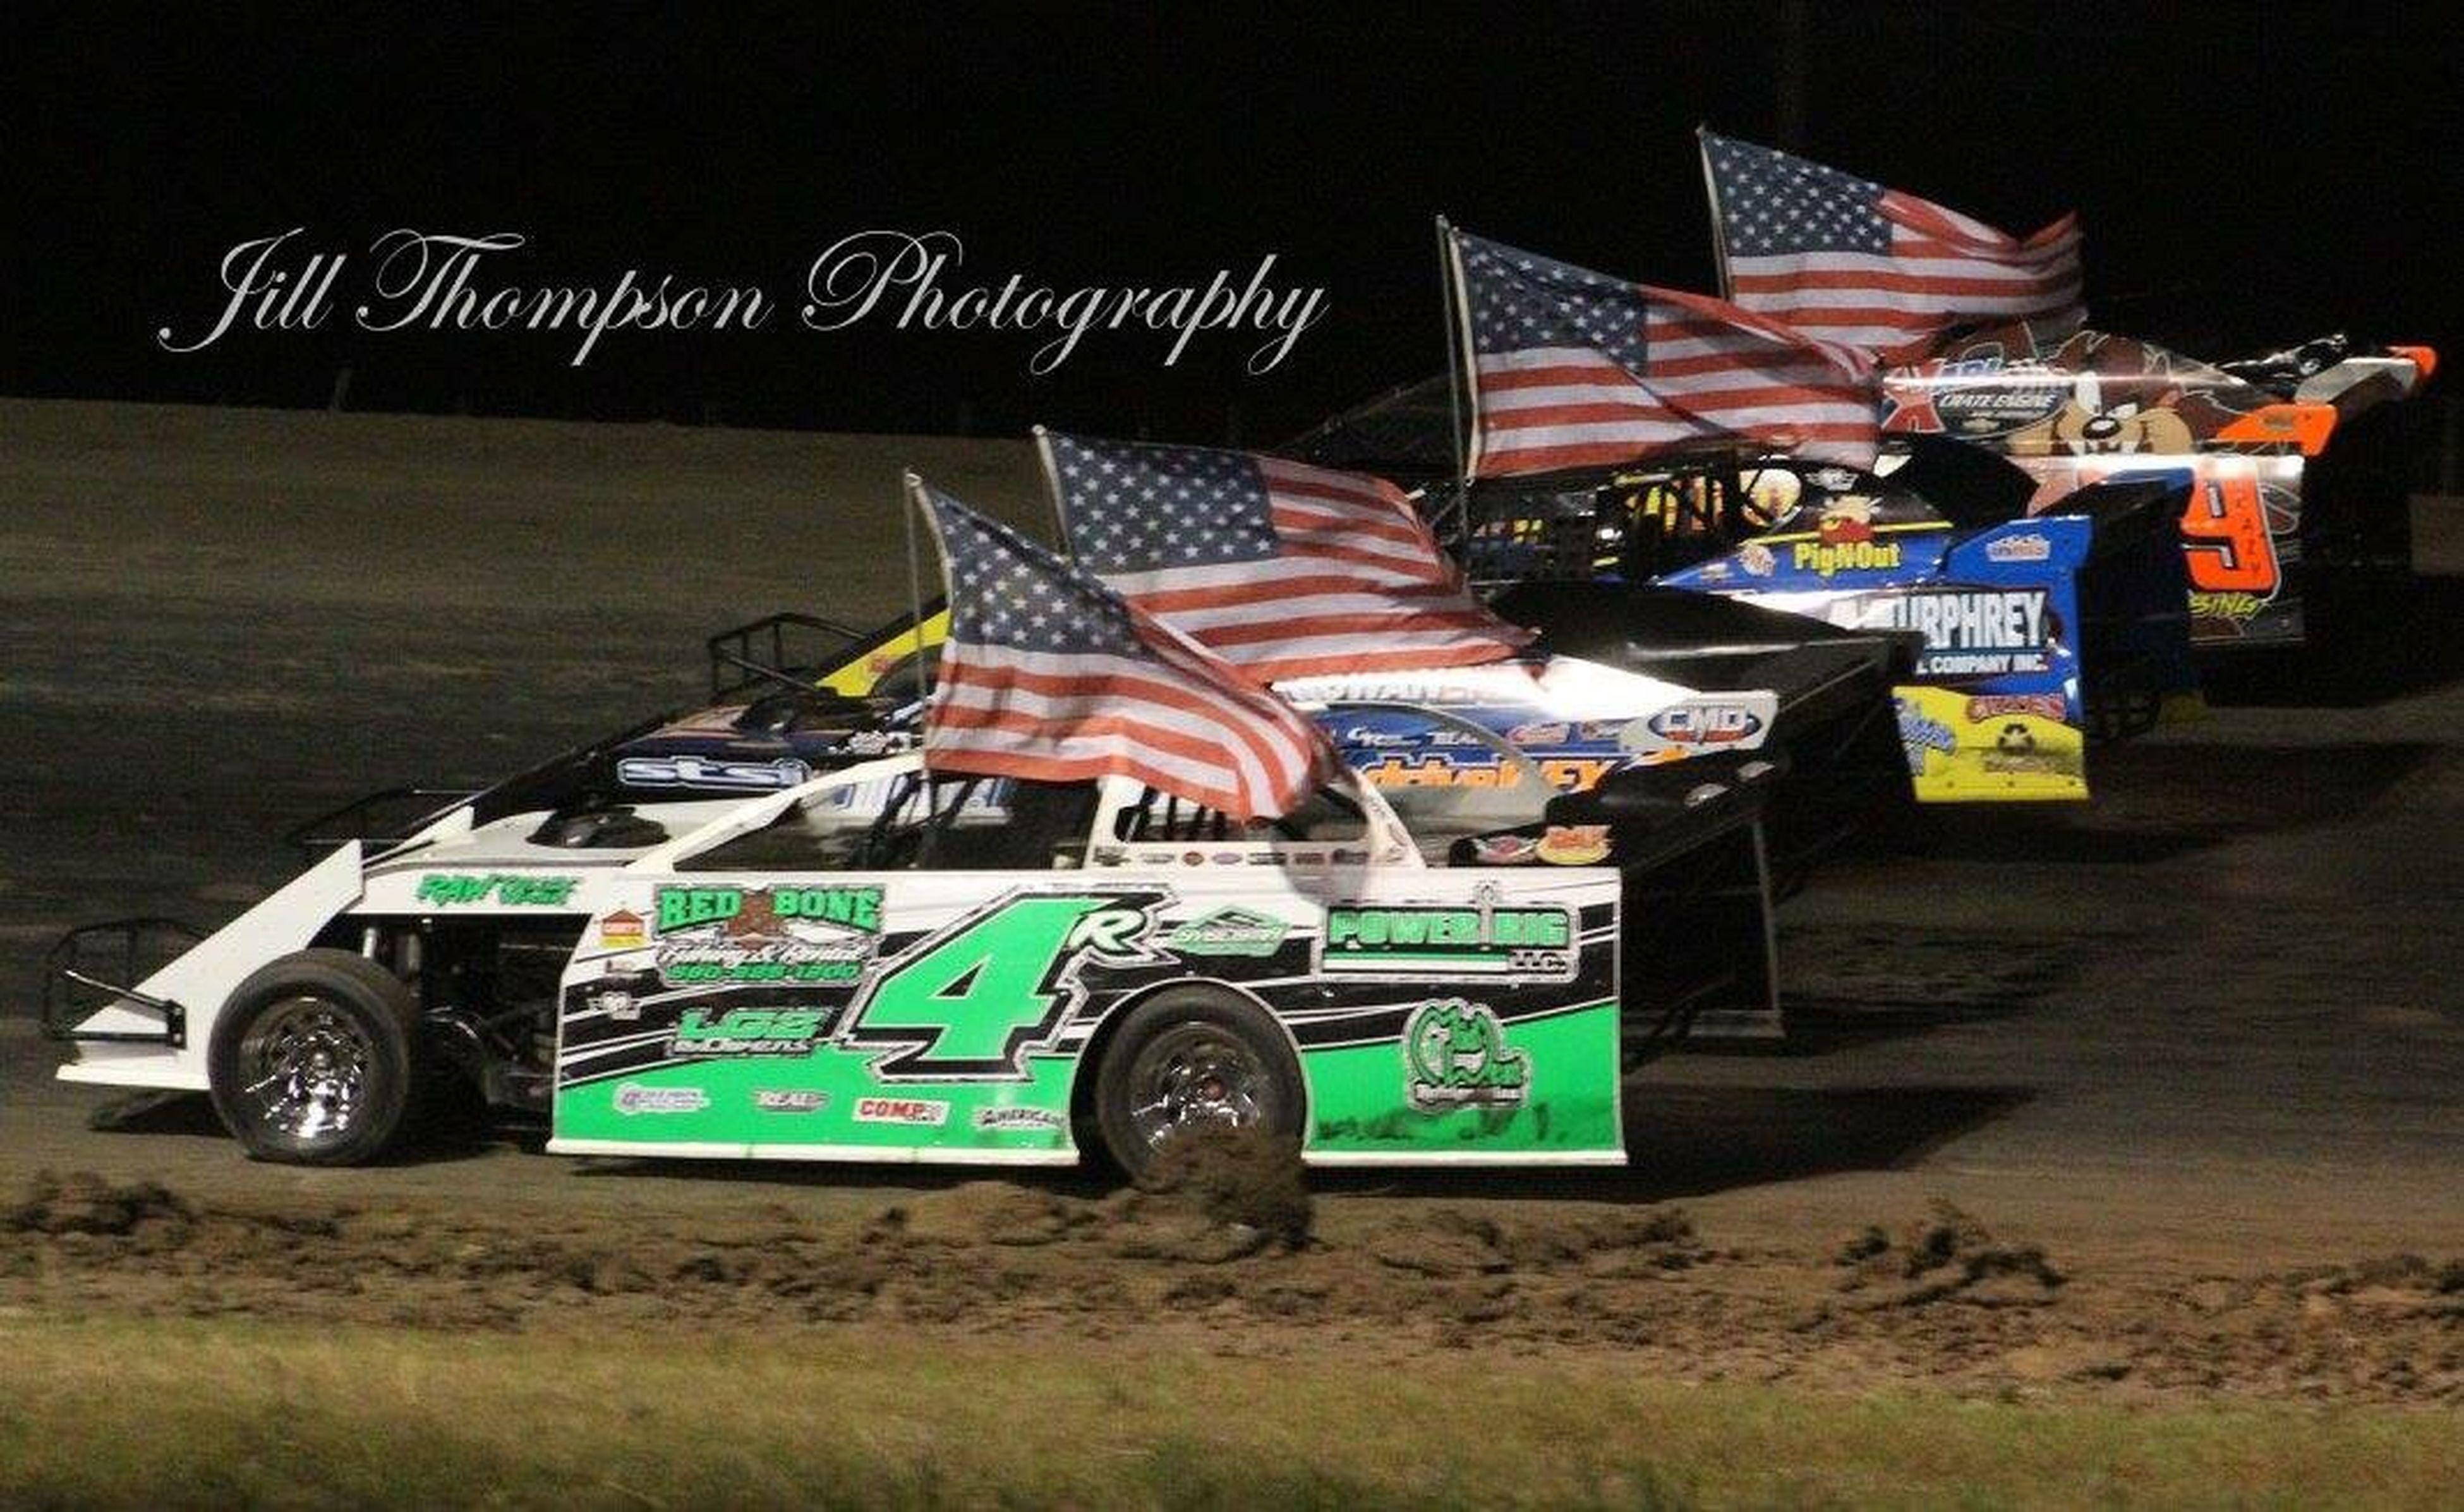 Usmts Patriotism Flag Racecars Racetrack